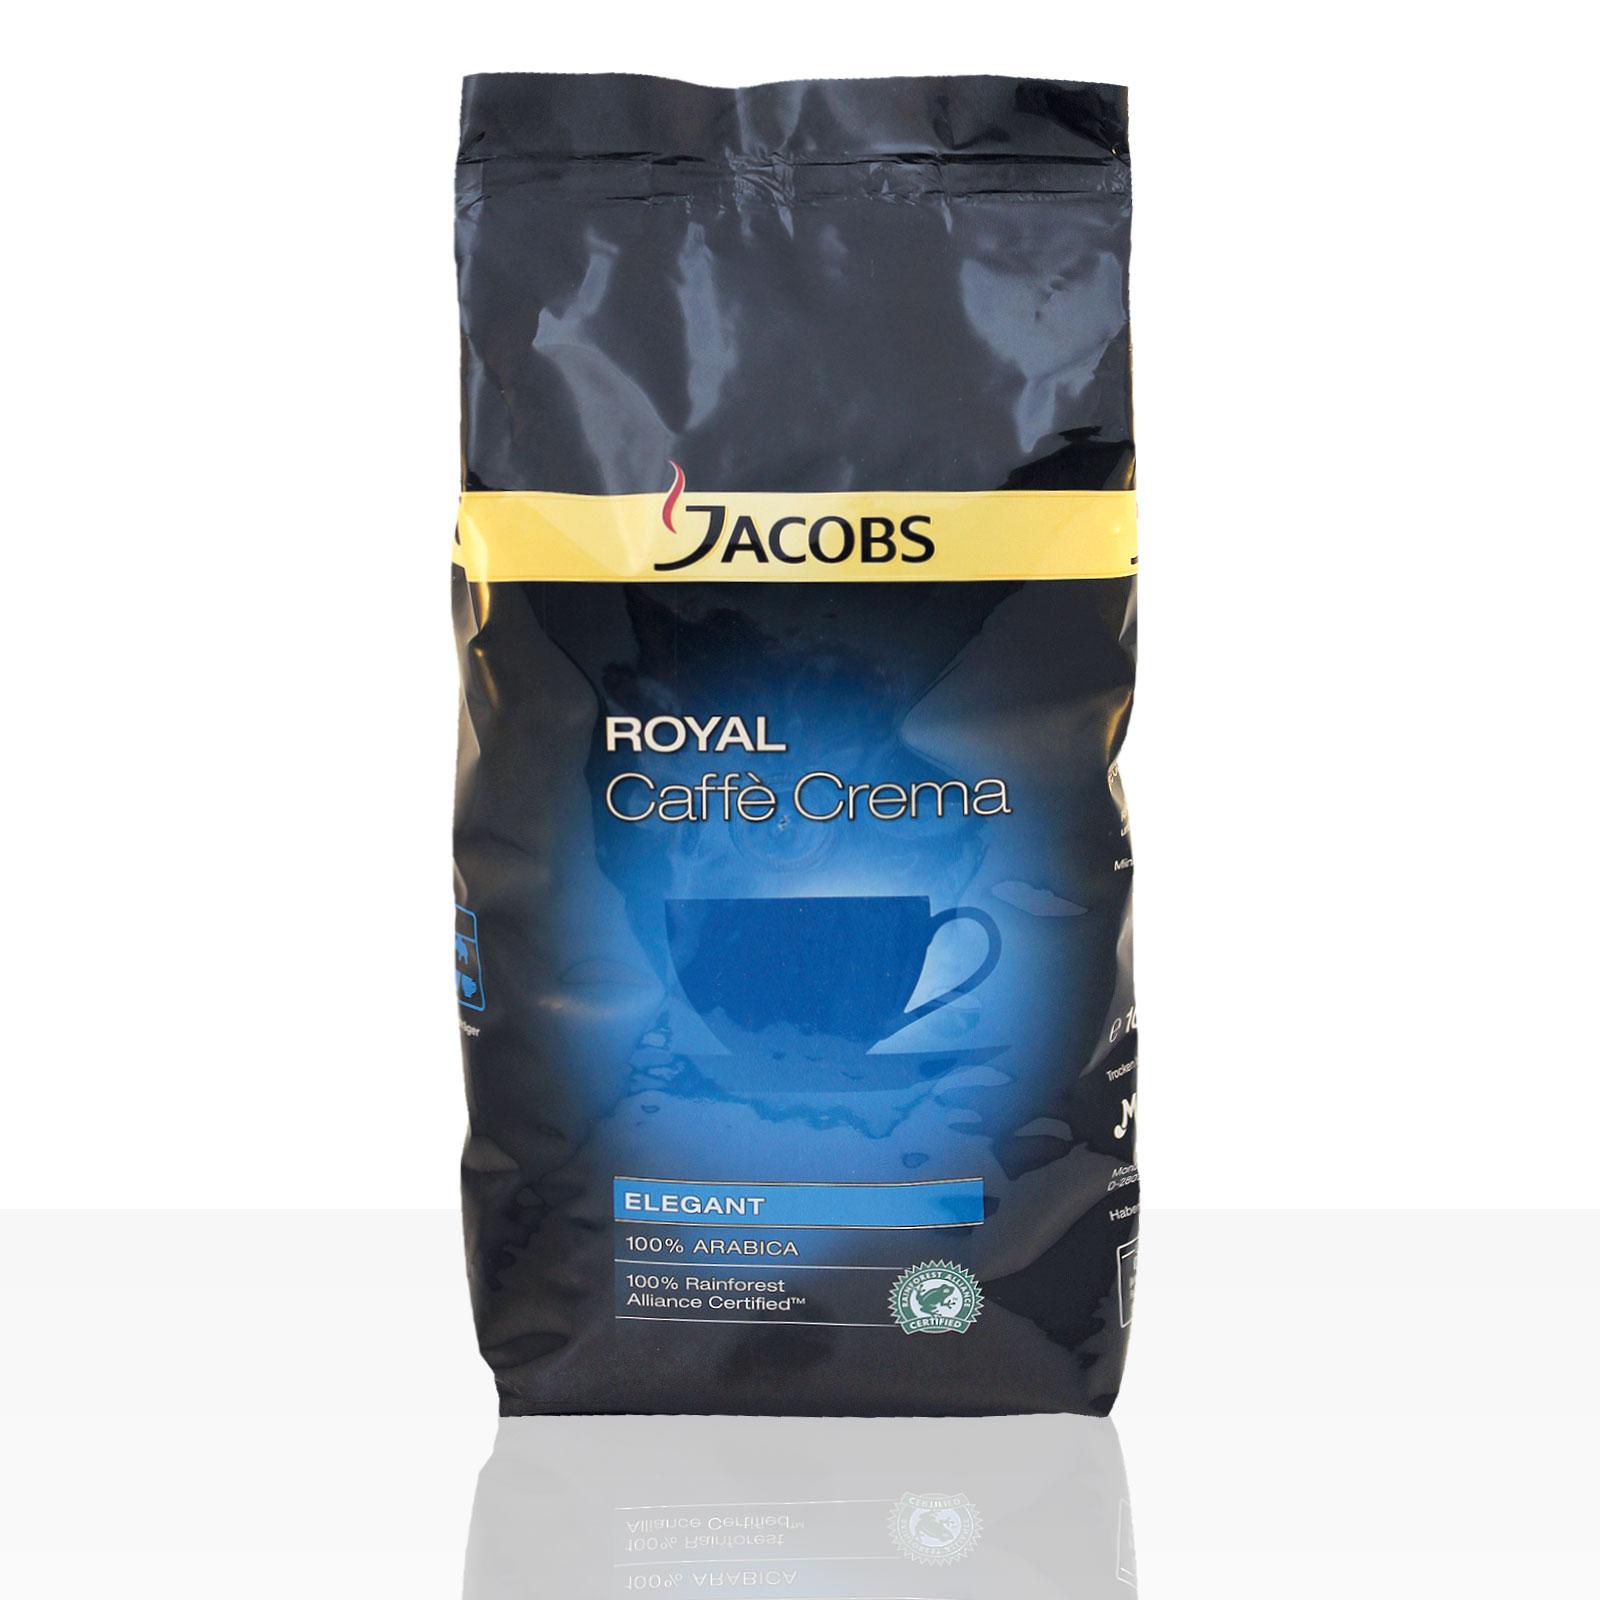 Jacobs Royal Caffe Crema Elegant - 1kg Kaffee ganze Bohne, 100% Arabica